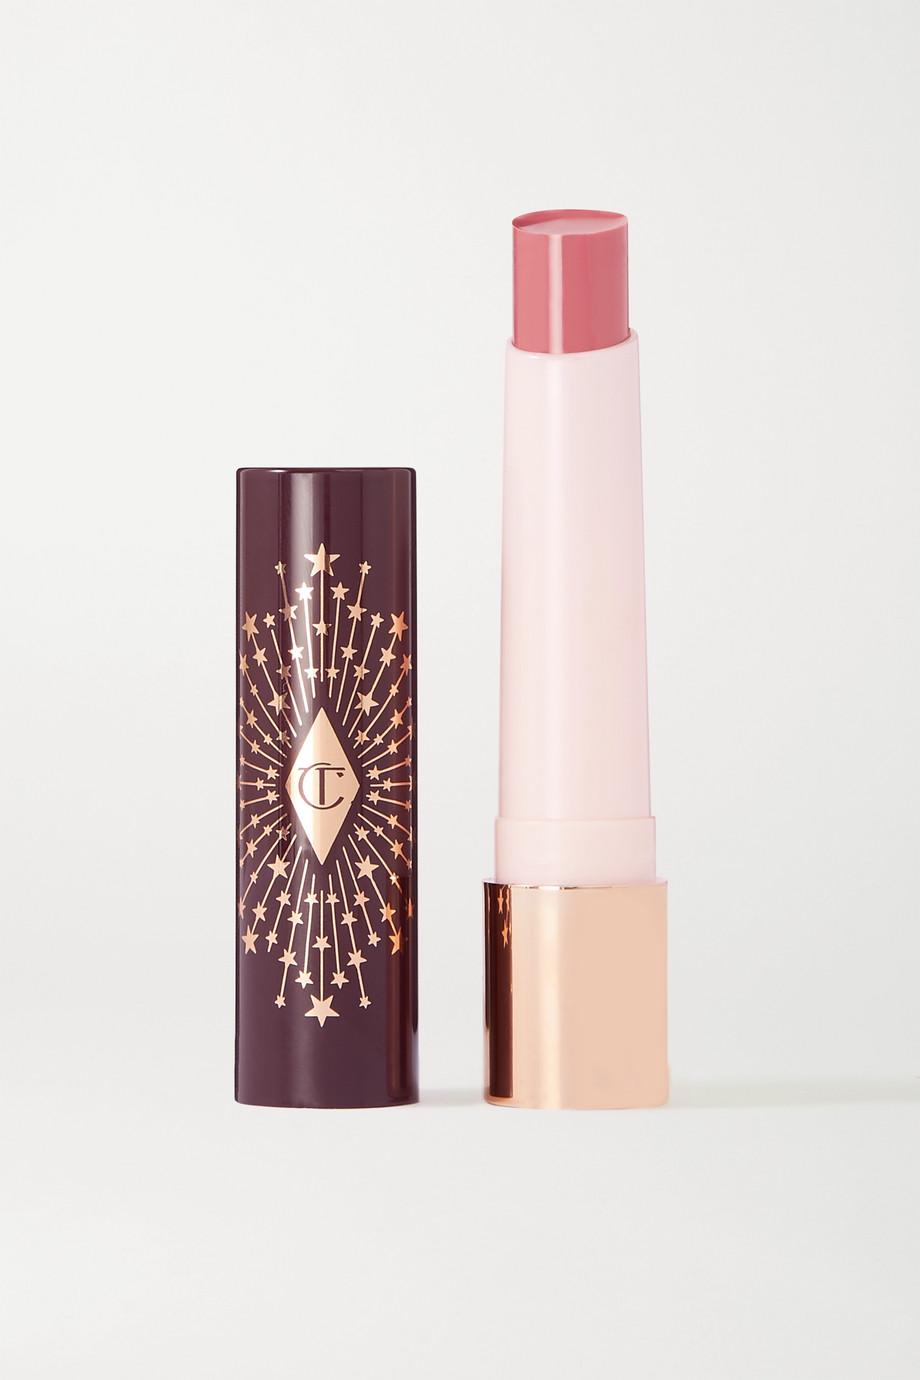 Charlotte Tilbury Hyaluronic Happikiss Lipstick Balm - Happipeach